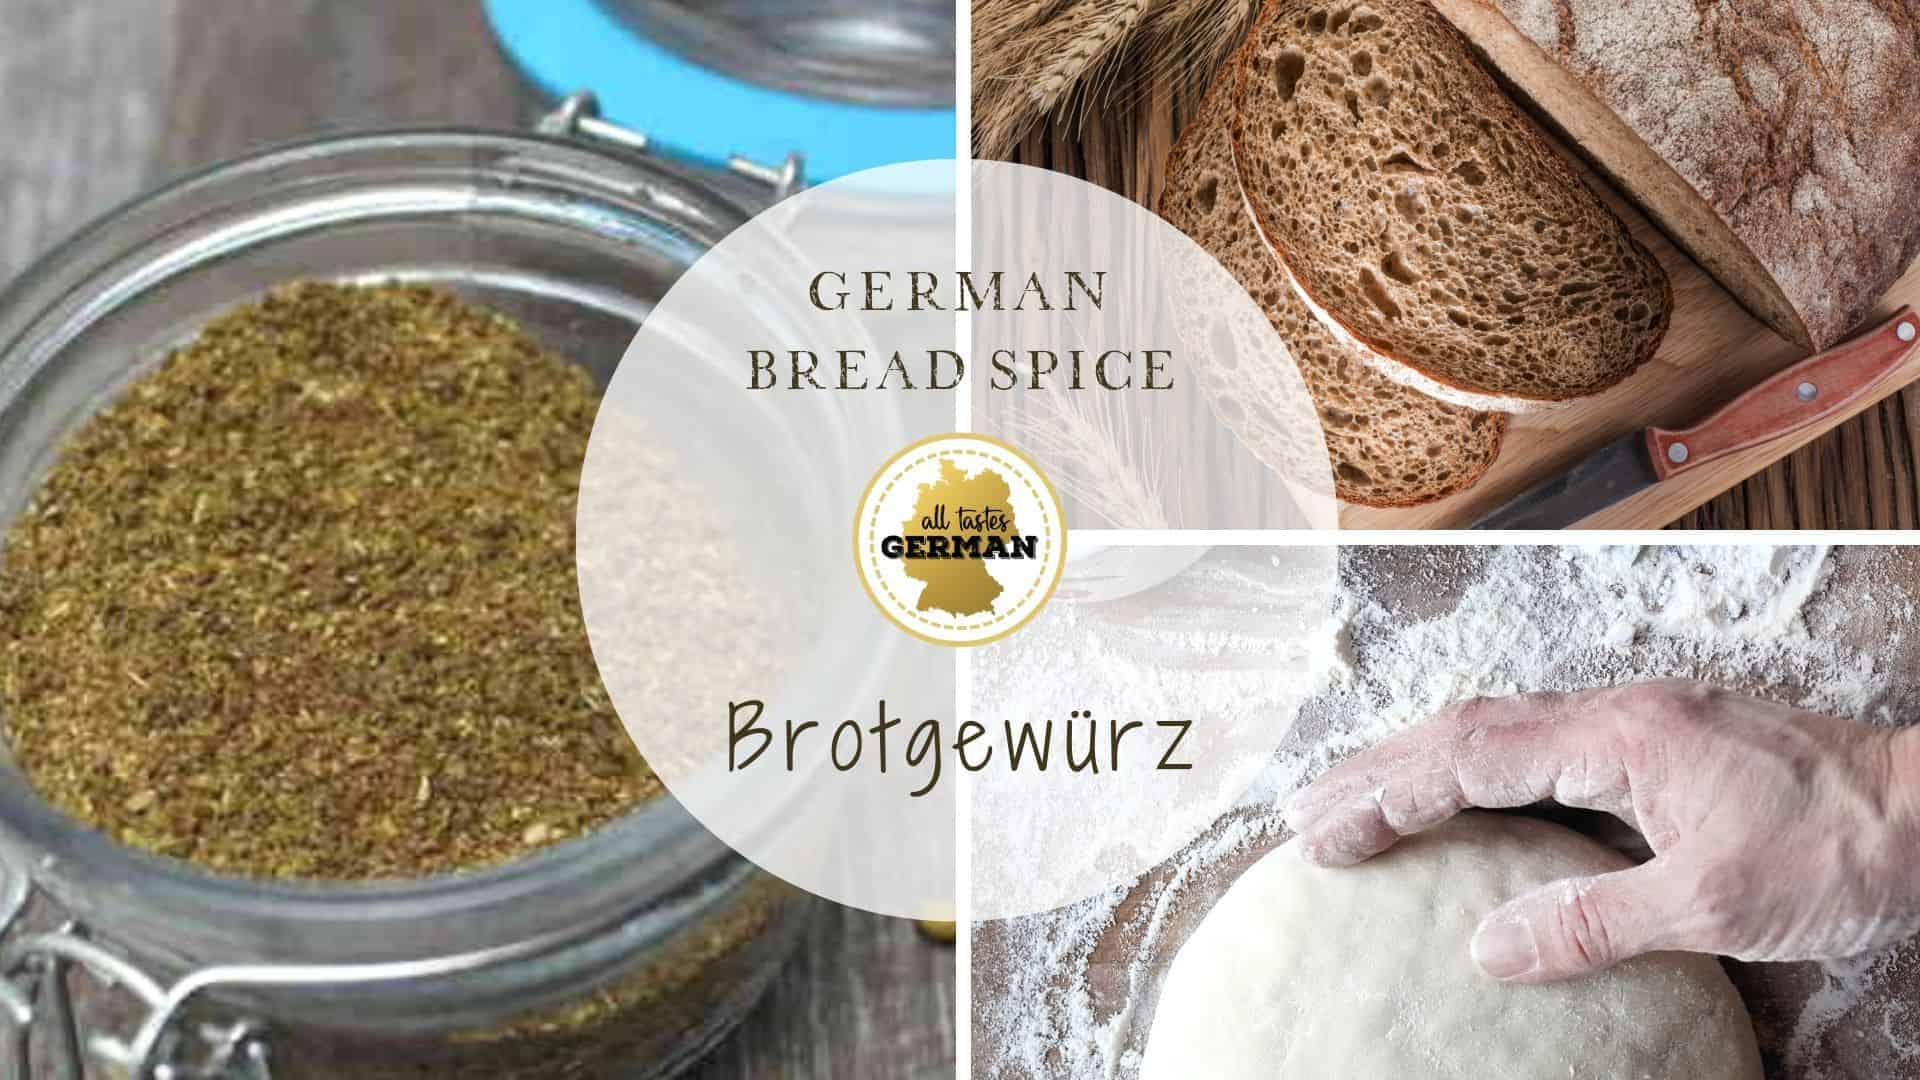 German Bread Spice